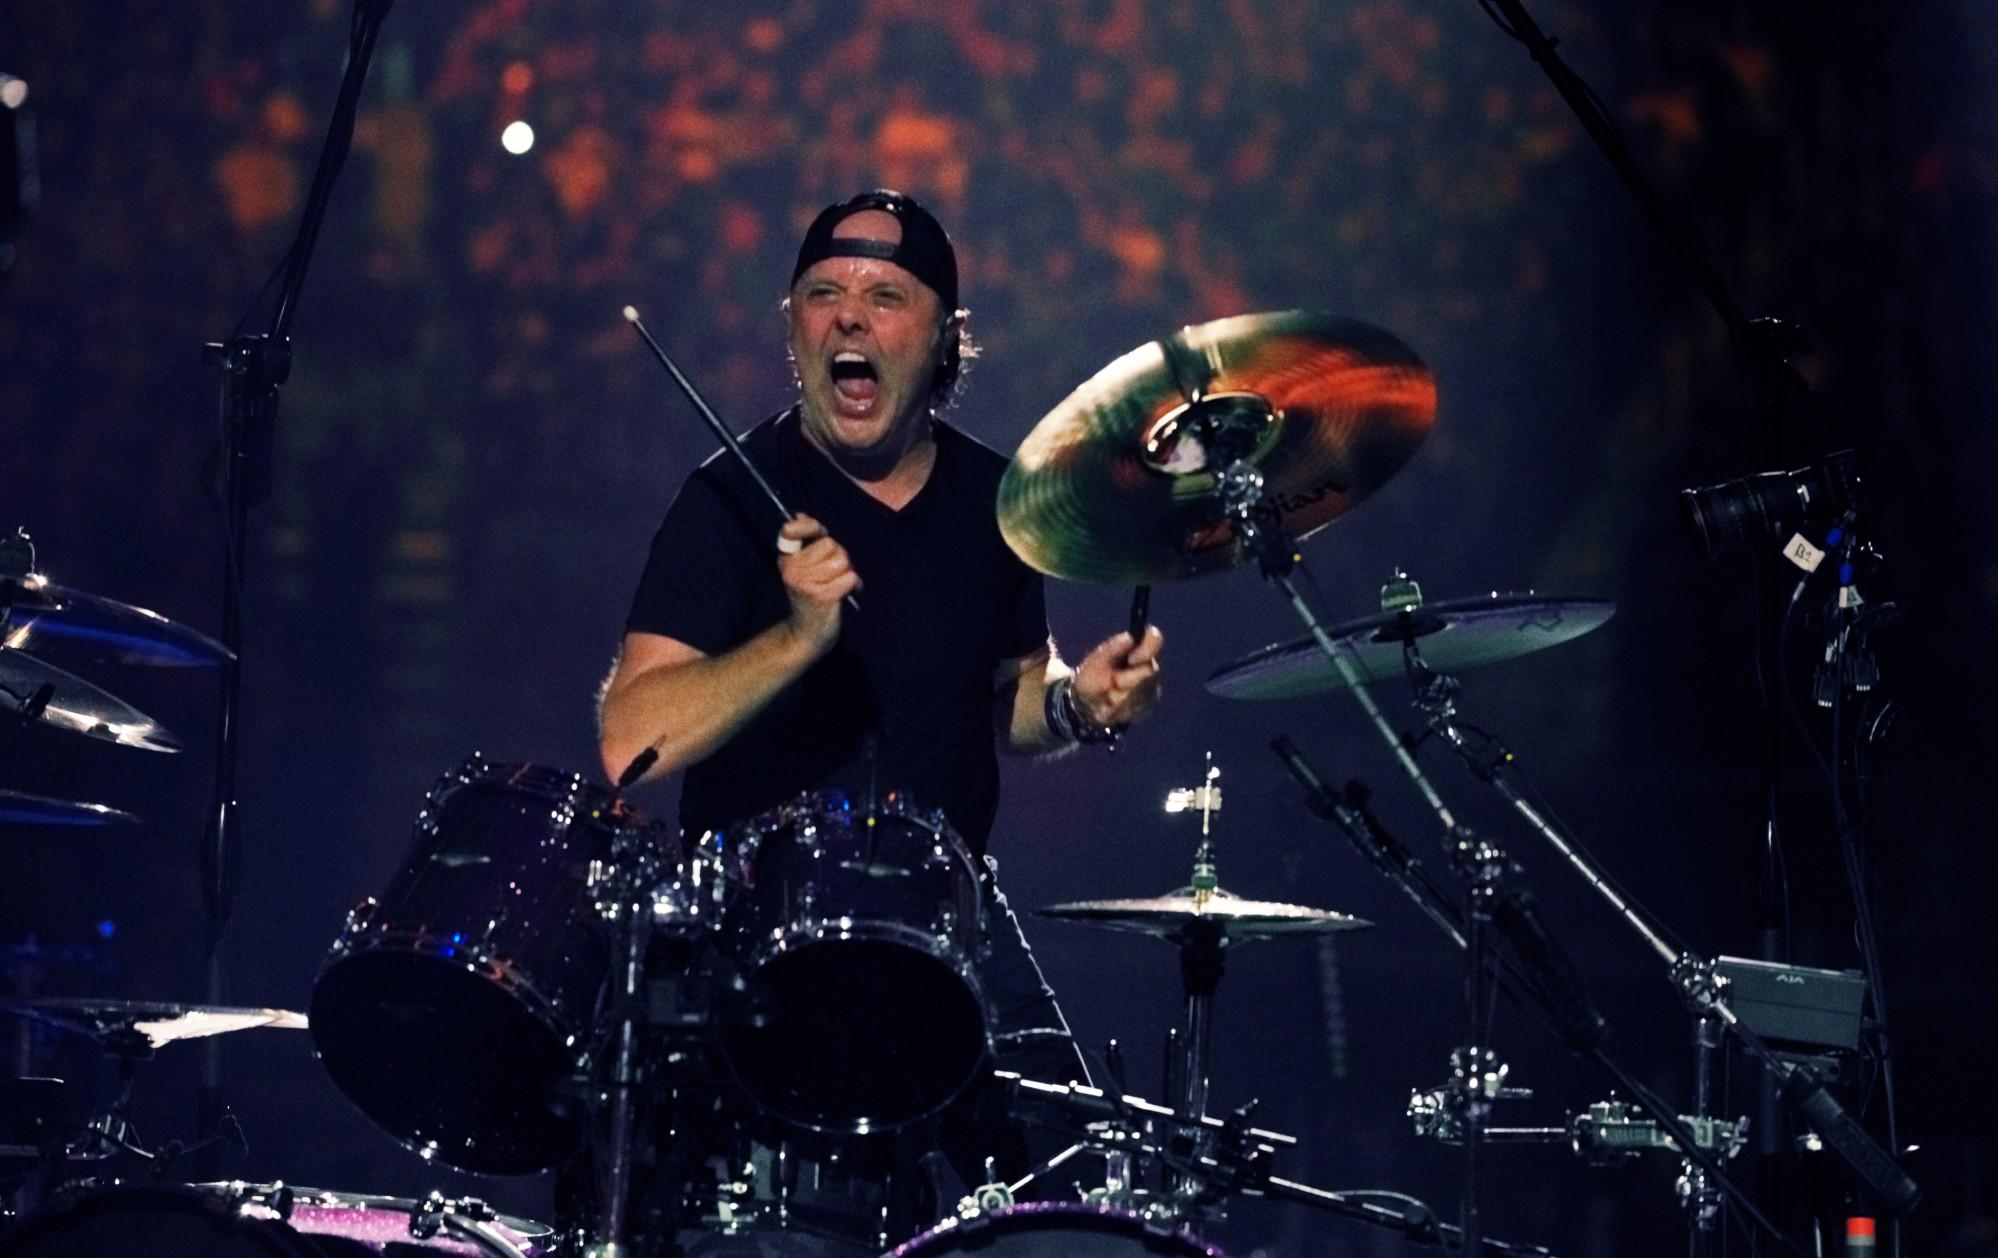 Metallica Lars Ulrich S&M 2 live